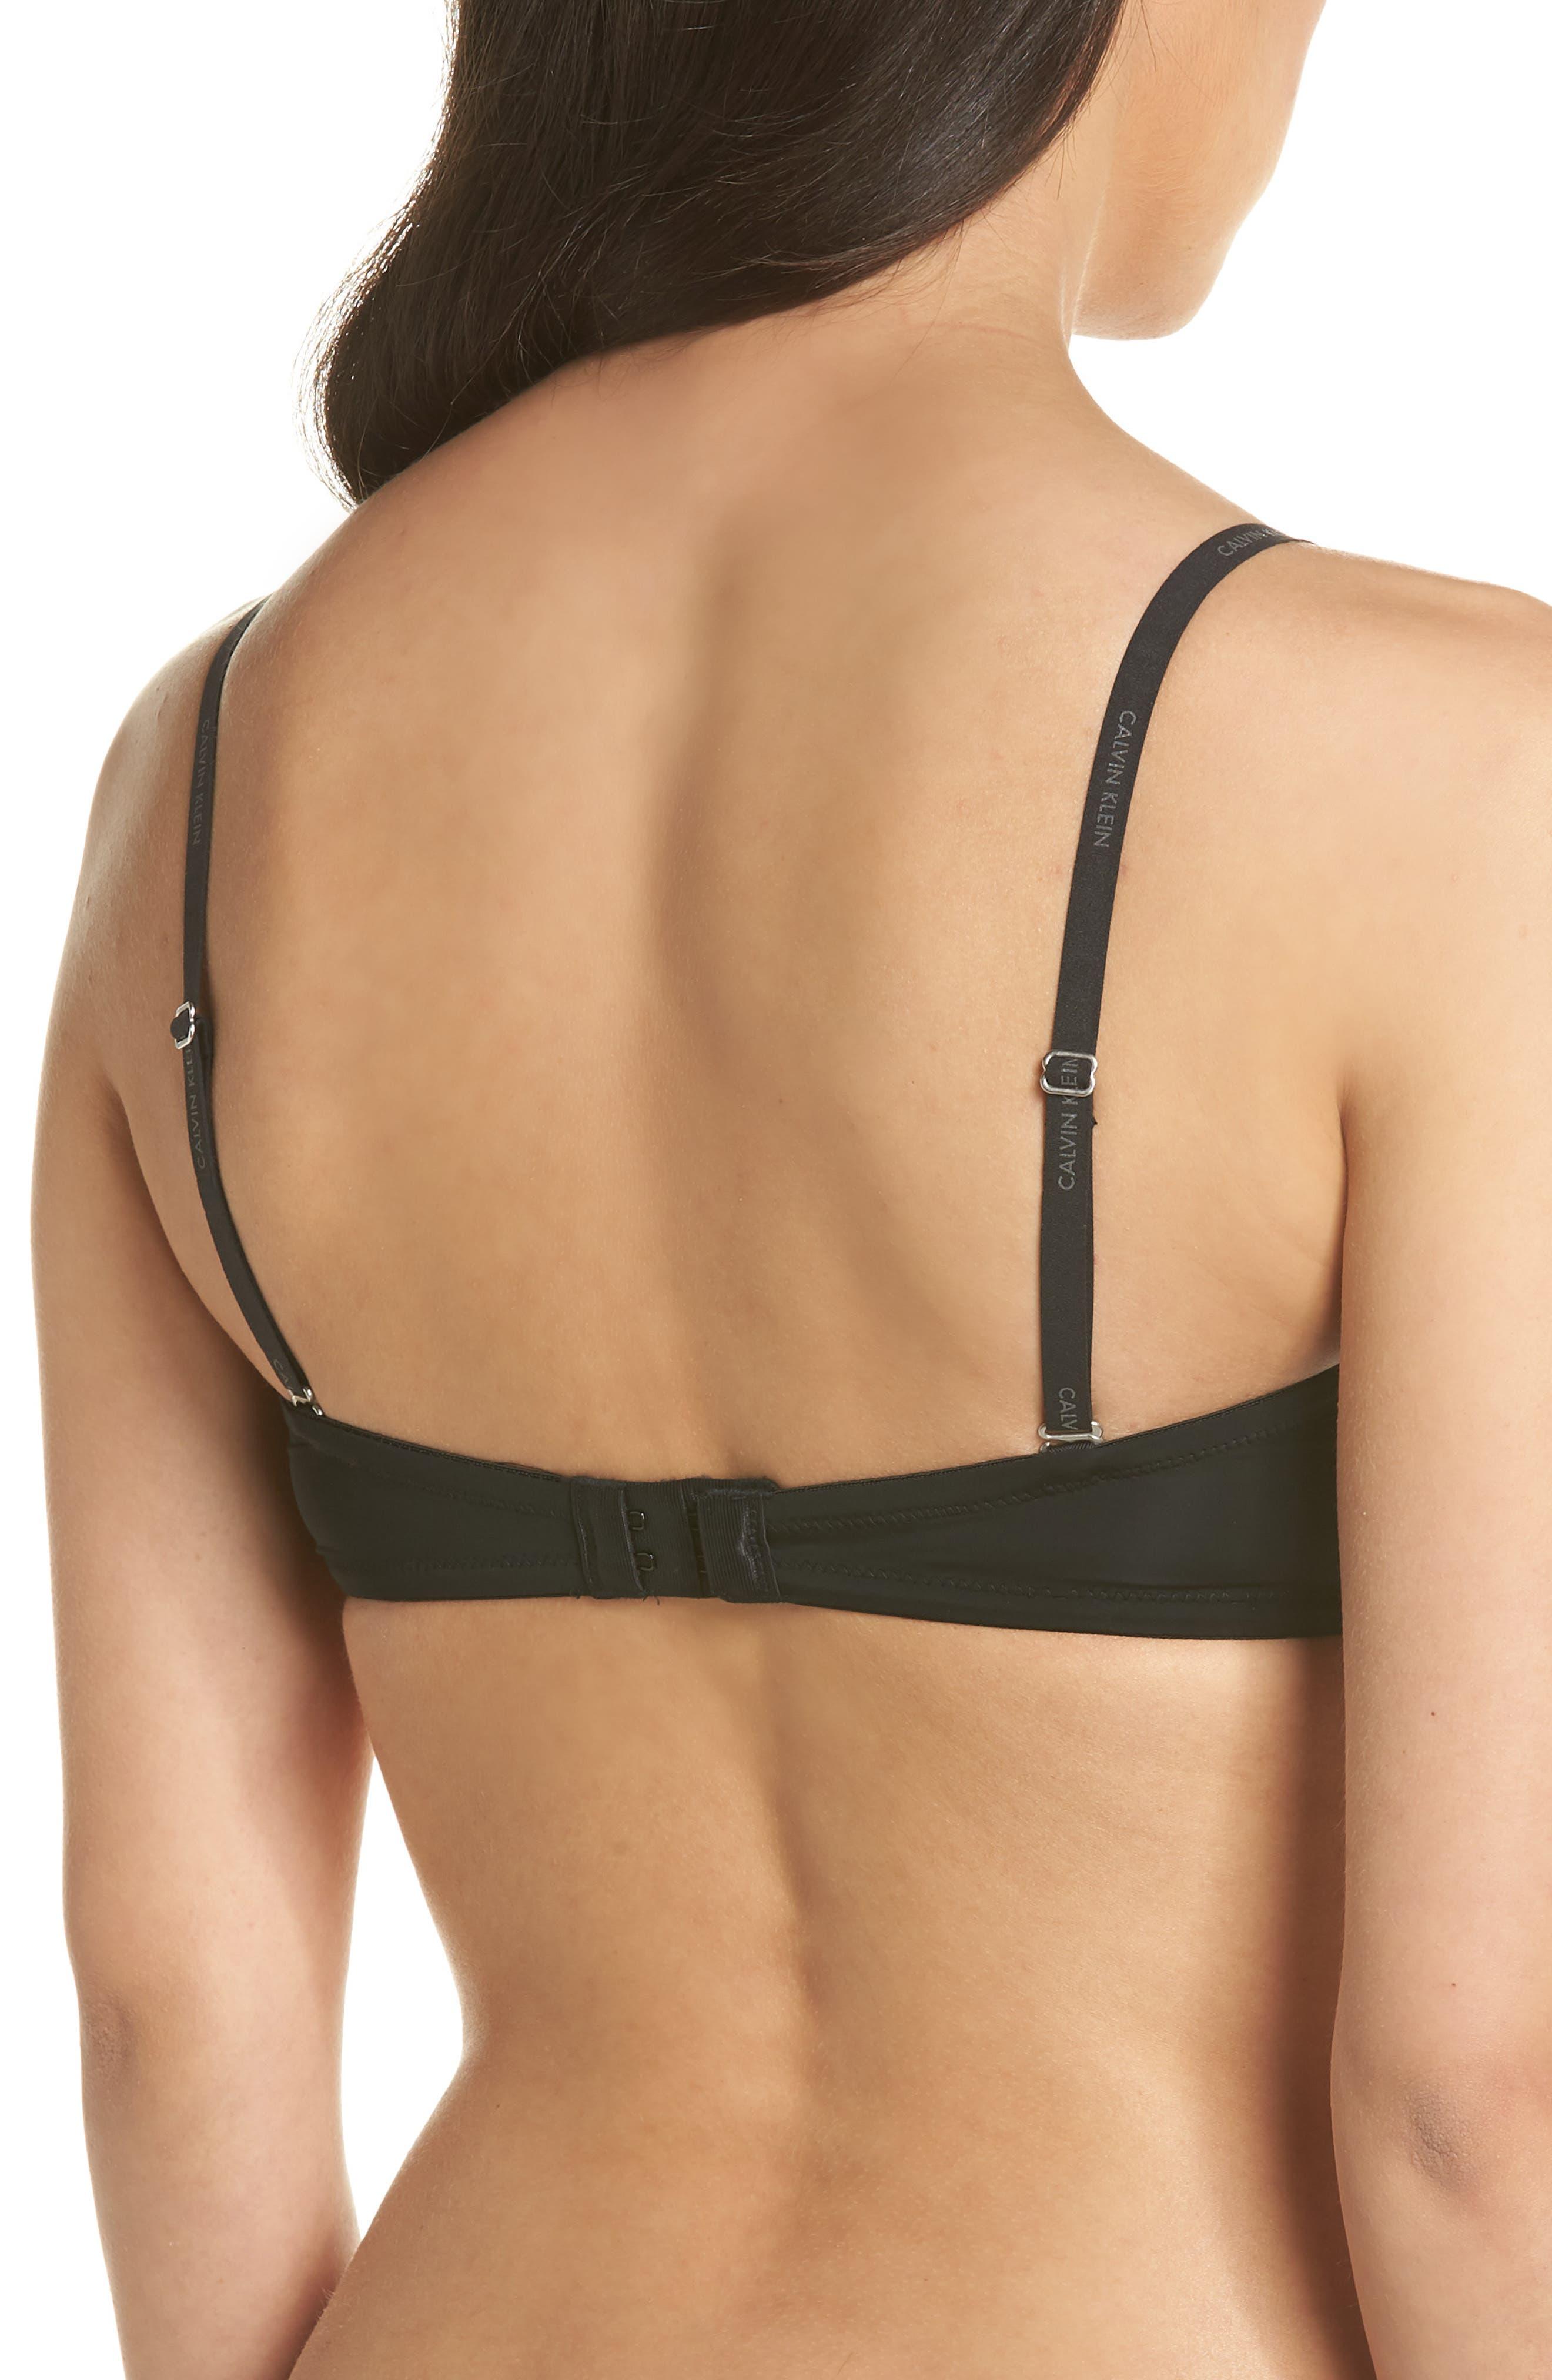 'Naked Glamour' Convertible Strapless Push-Up Bra,                             Alternate thumbnail 3, color,                             Black